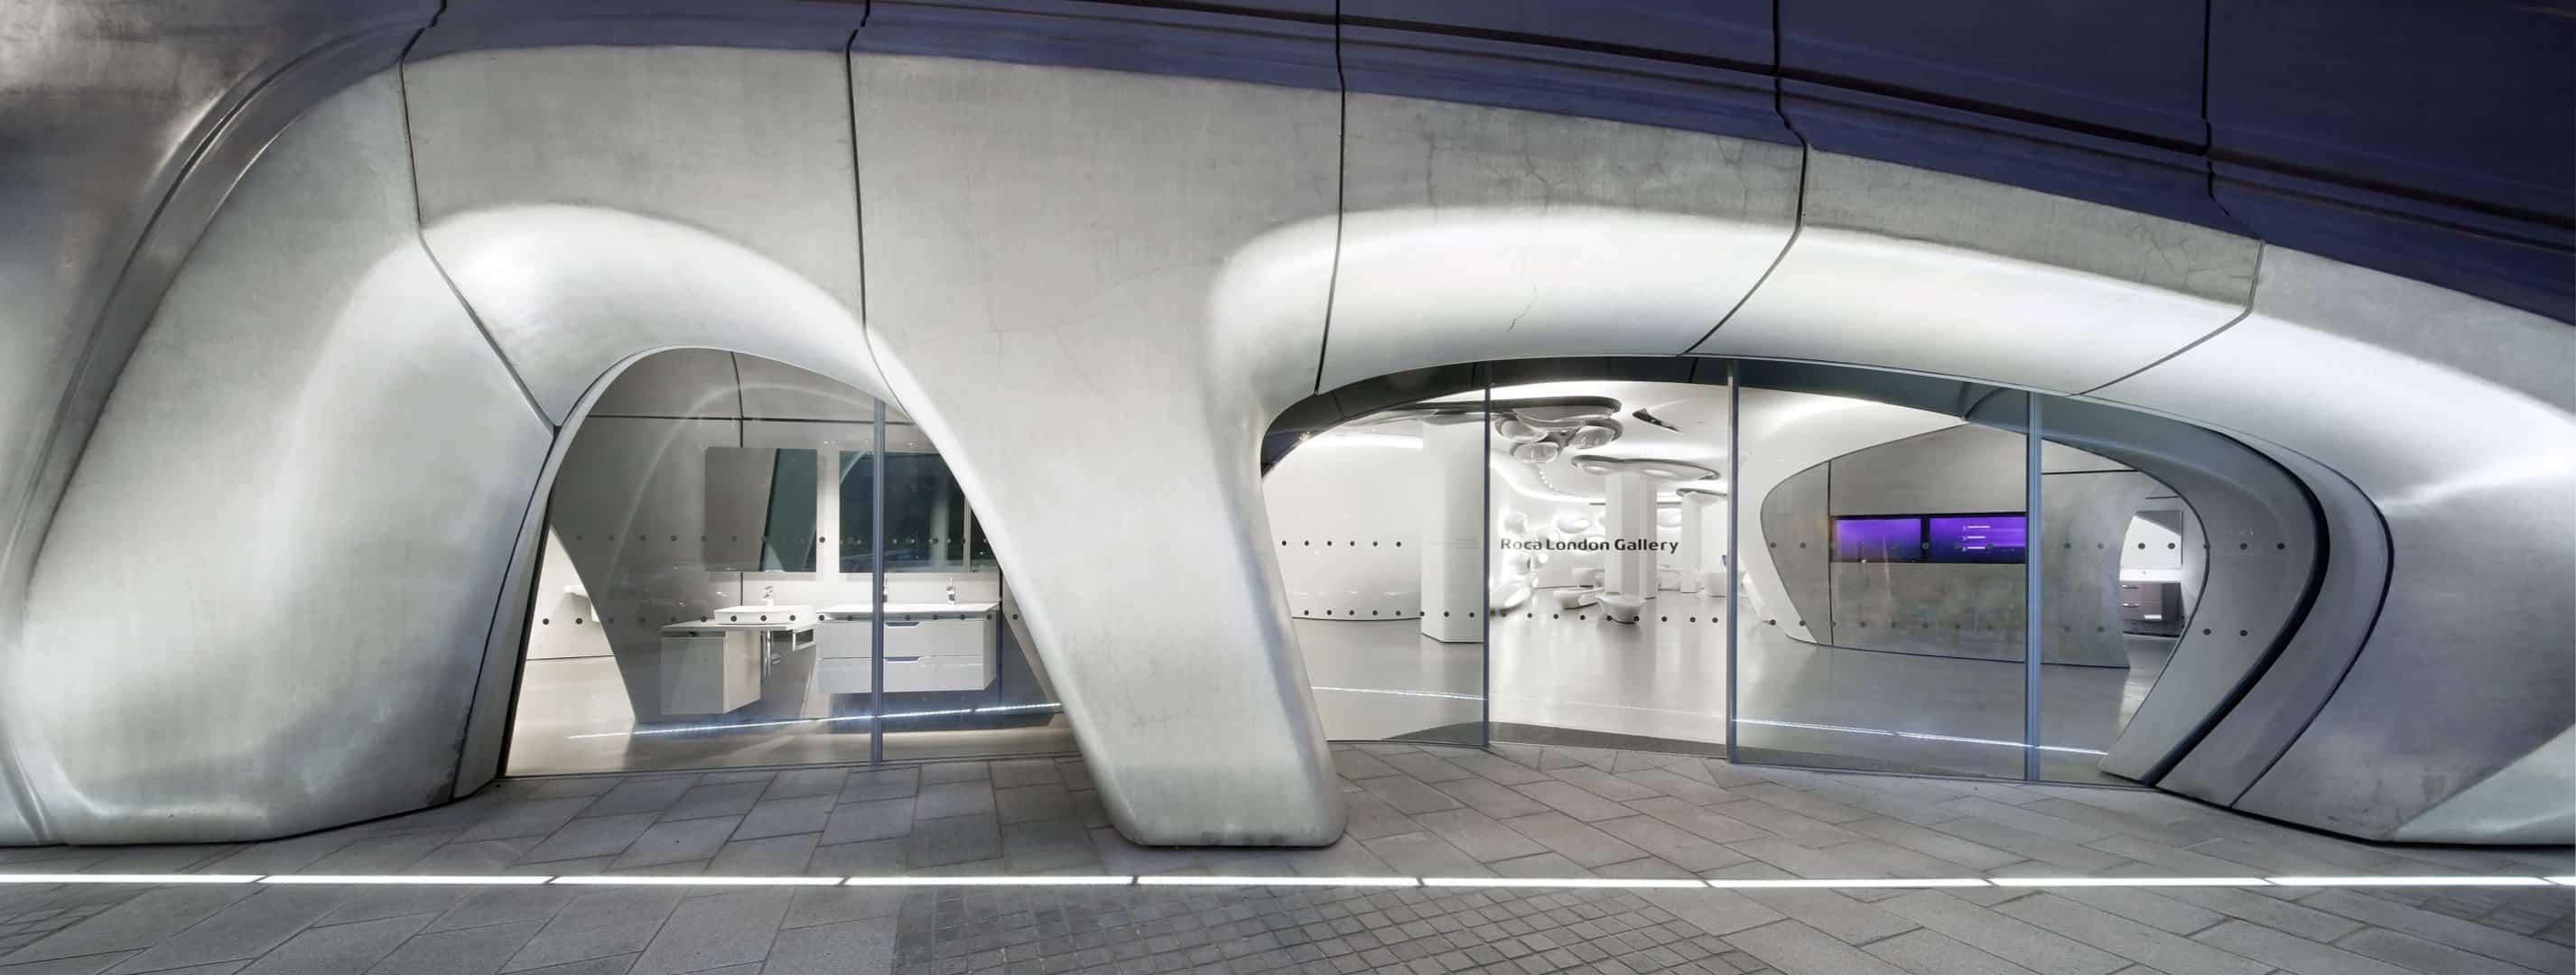 Zaha Hadid Product Design - the roca gallery london 020